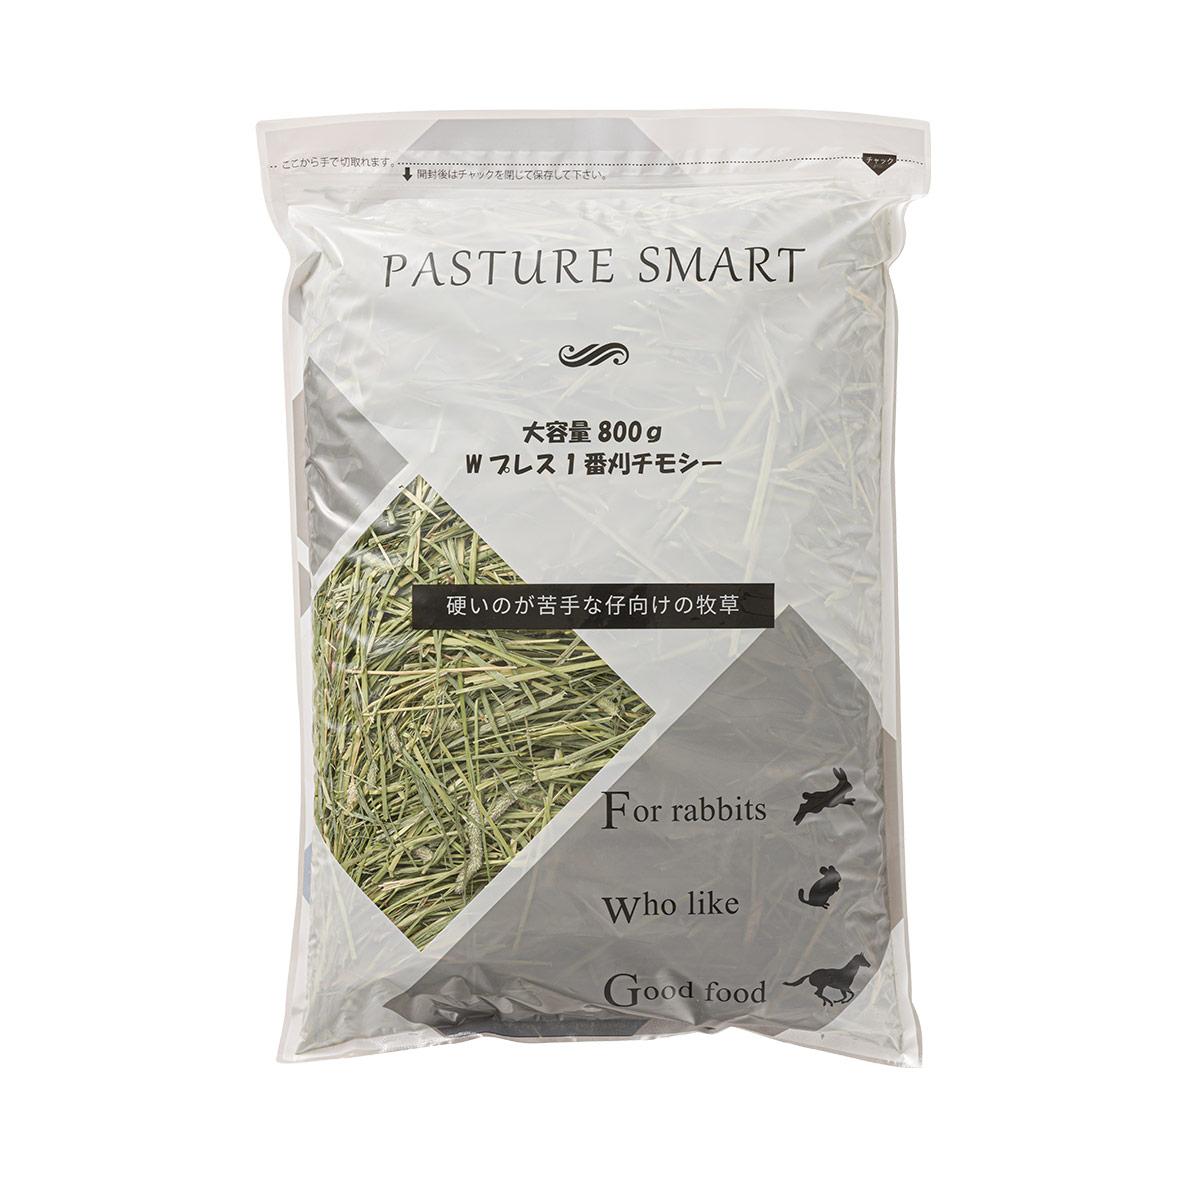 Pasture Smart